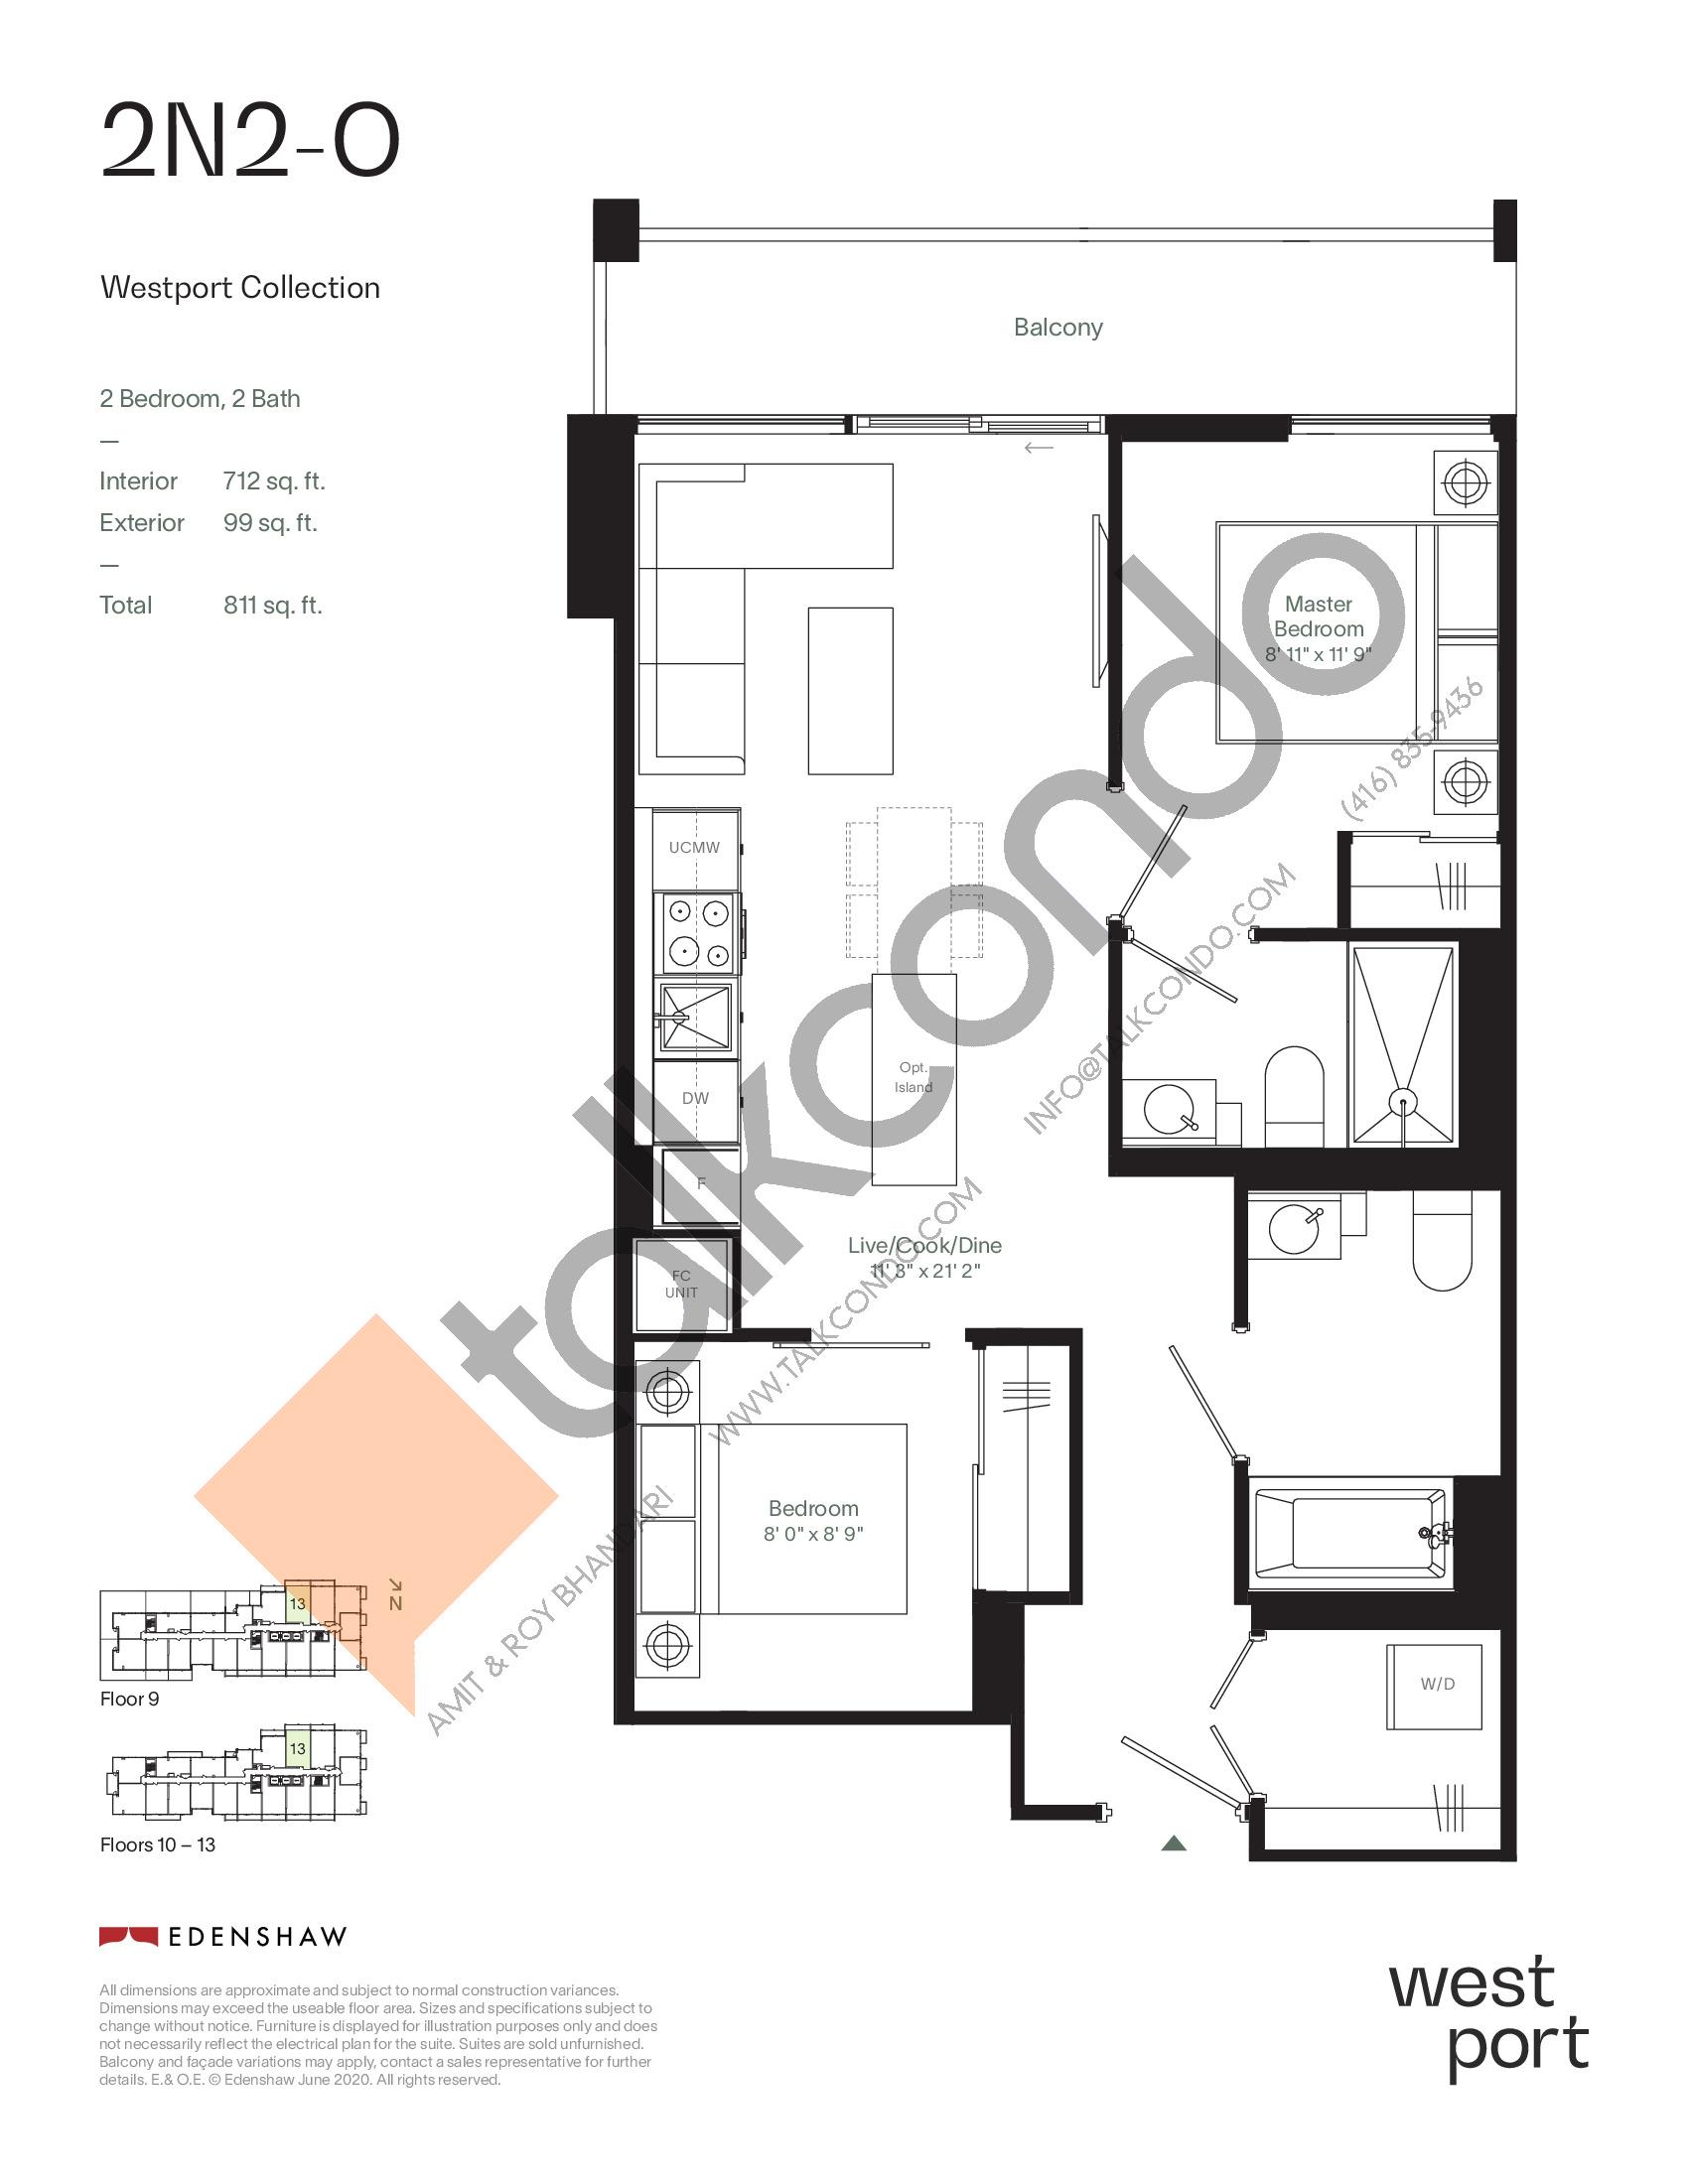 2N2-O - Westport Collection Floor Plan at Westport Condos - 712 sq.ft